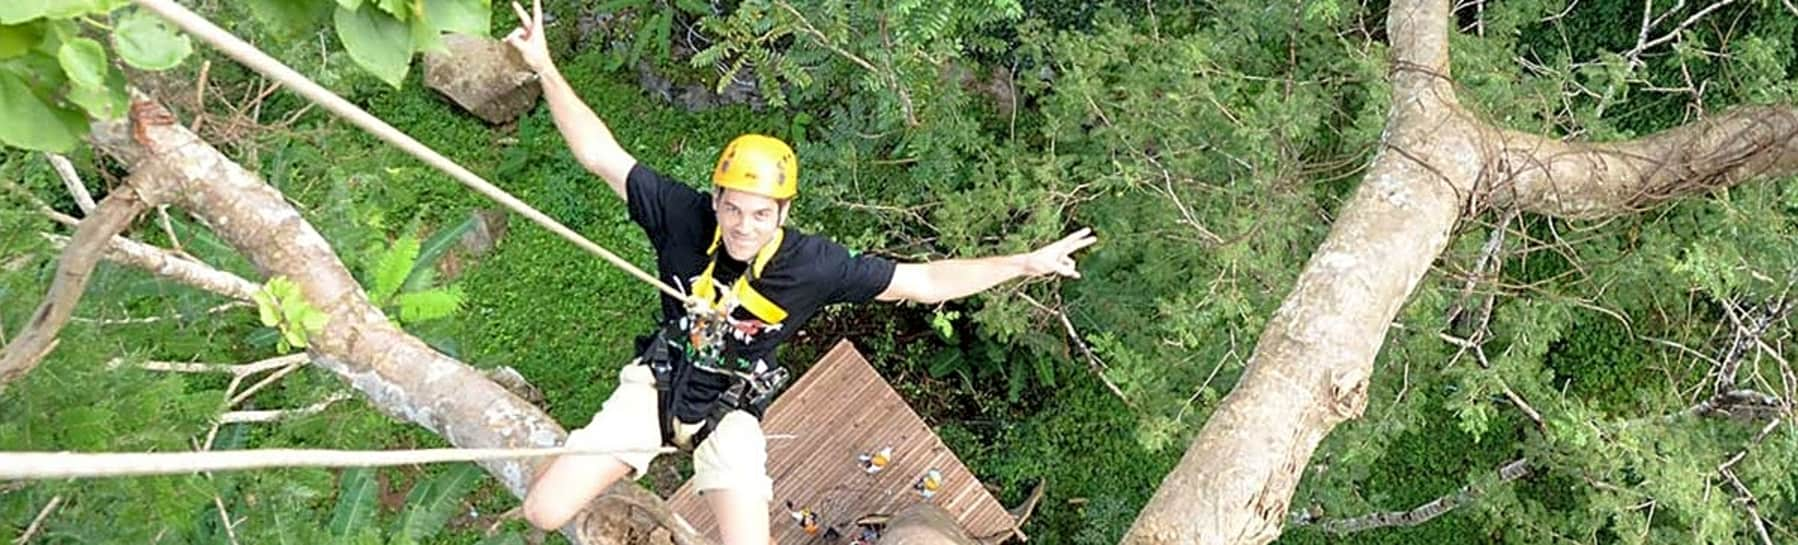 Flying Hanuman Phuket— Ultimate Zipline Discovery Journey C  gallery